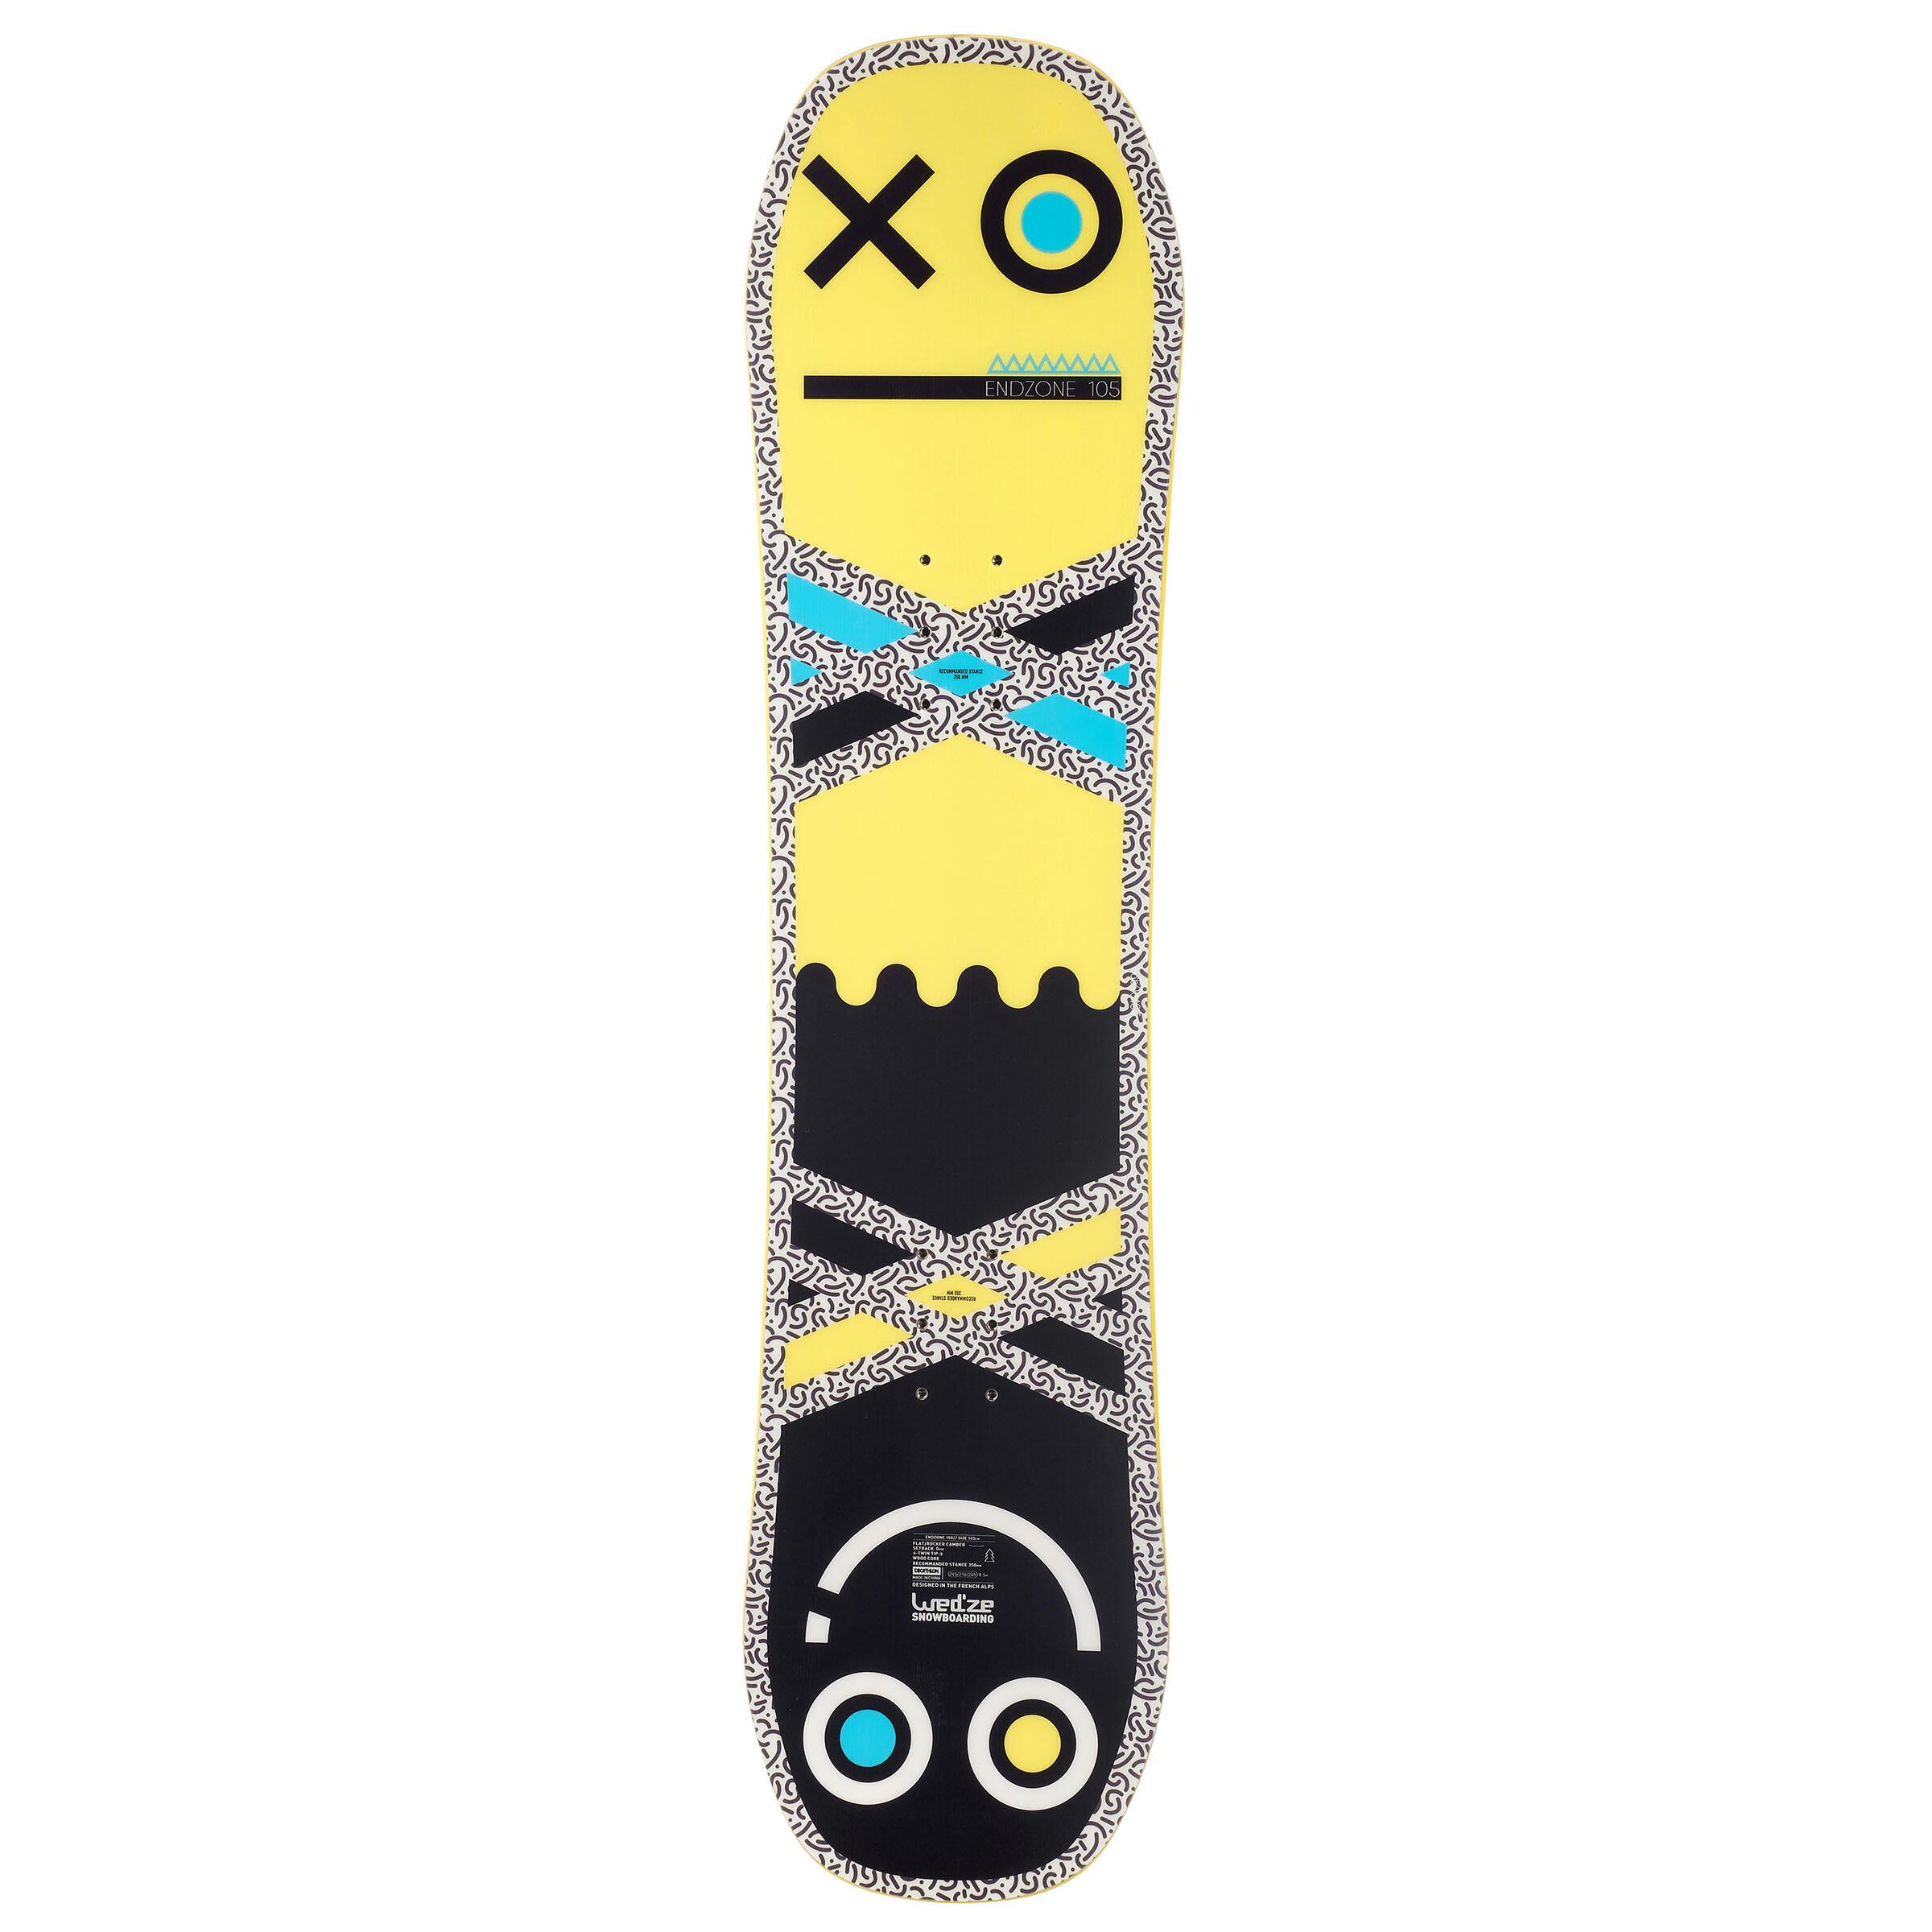 Planche de snowboard all mountain freestyle junior, Endzone 105 cm - Wedze